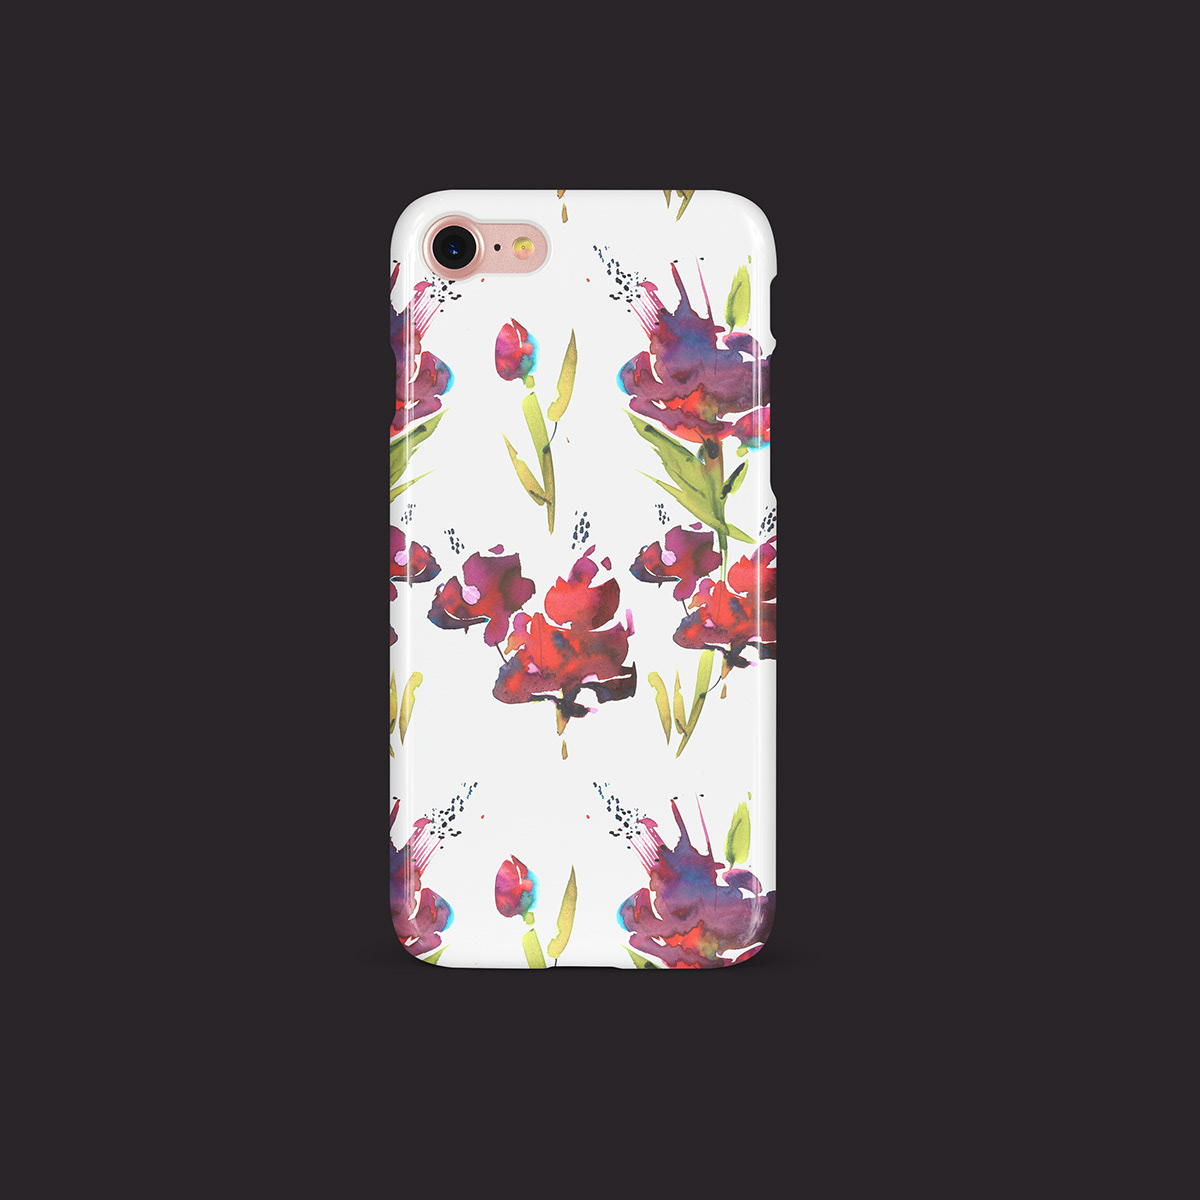 art creative Flowers graphicart pattern plants wallpaper watercolor